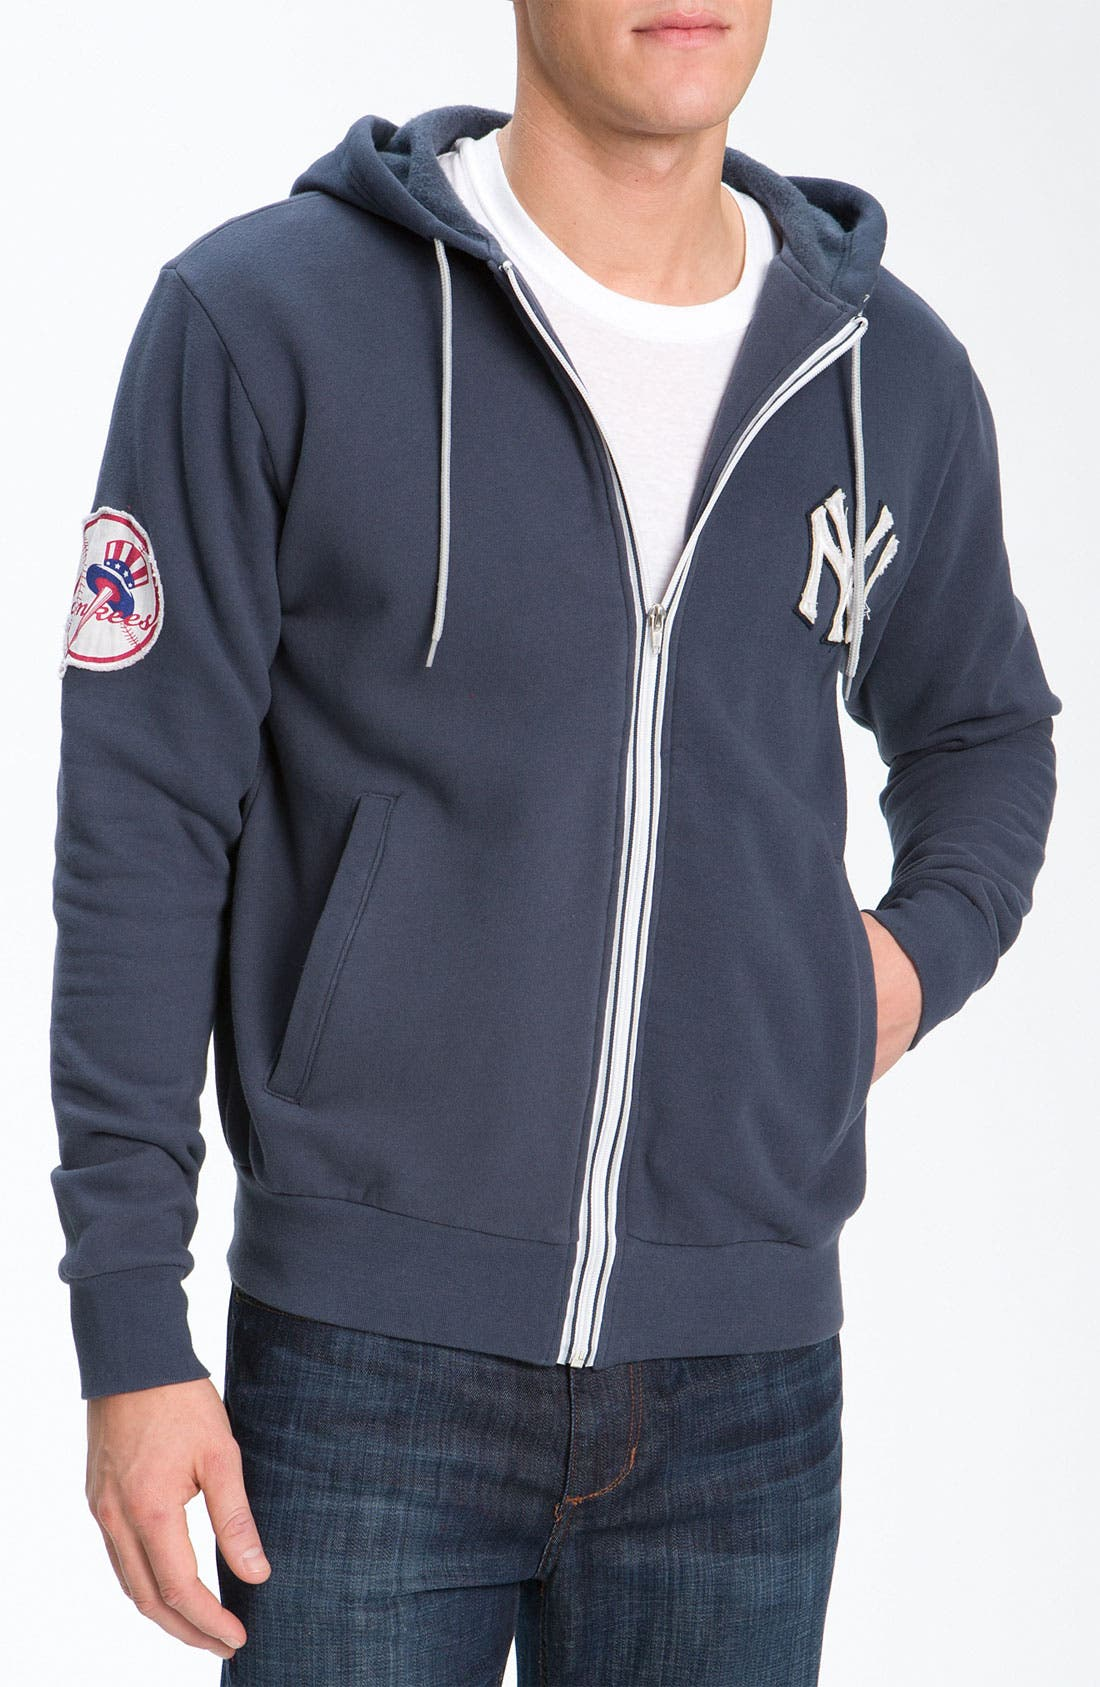 Alternate Image 1 Selected - Wright & Ditson 'New York Yankees' Hoodie